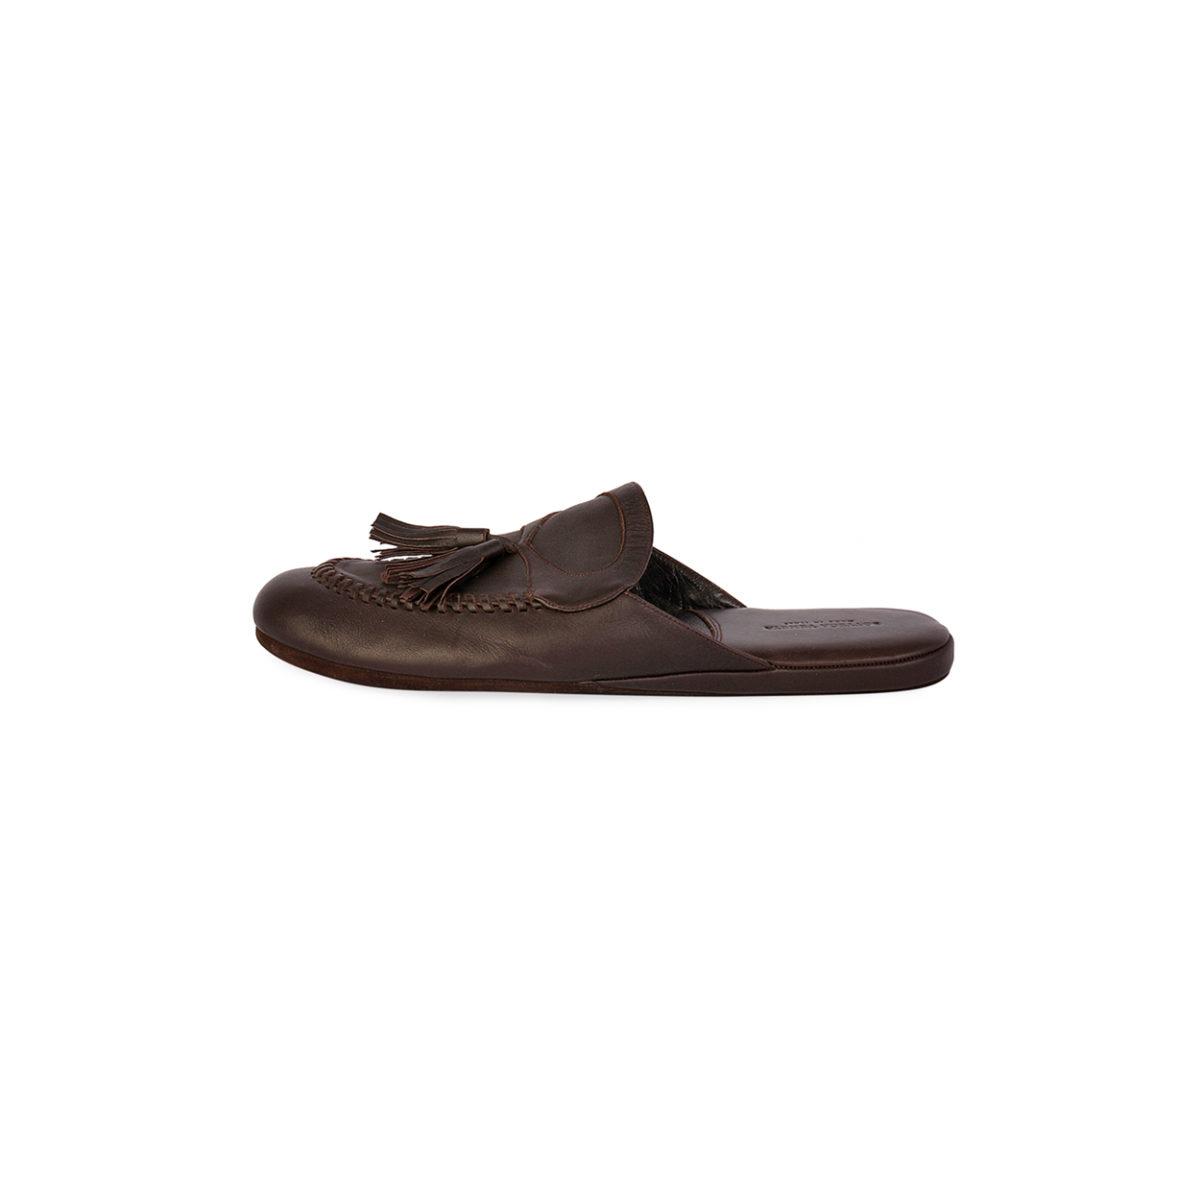 3c4bdcb5487d BOTTEGA VENETA Leather Slippers Brown - S  44 (9.5)